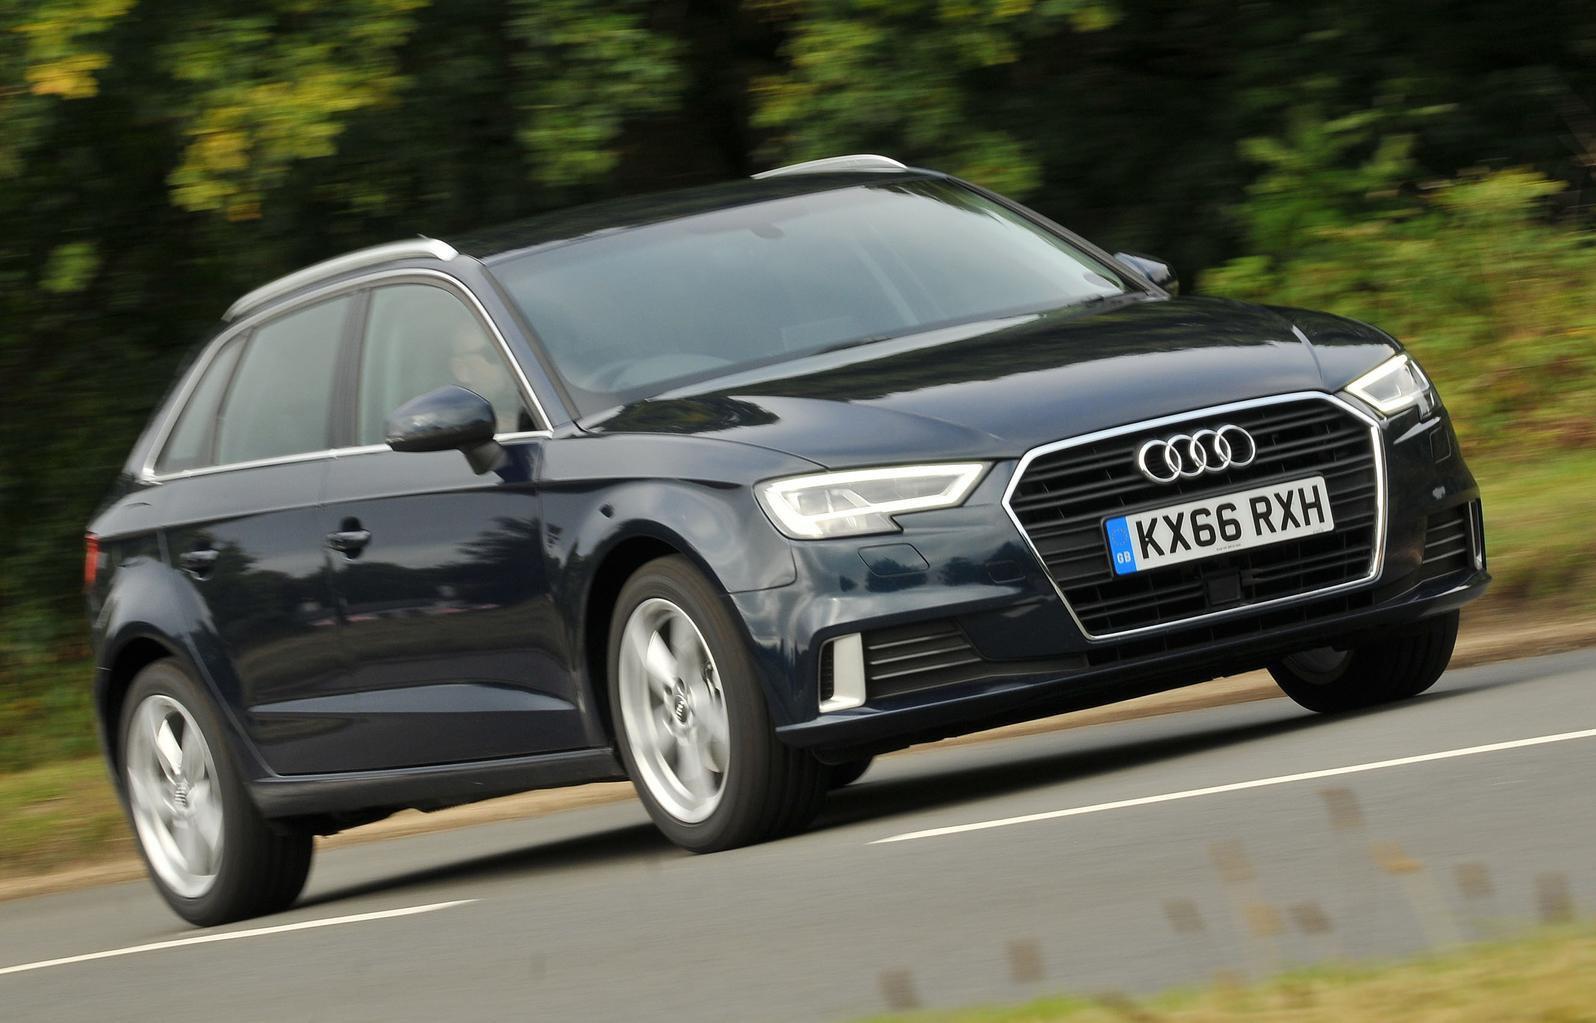 Best car deals for less than £300 per month